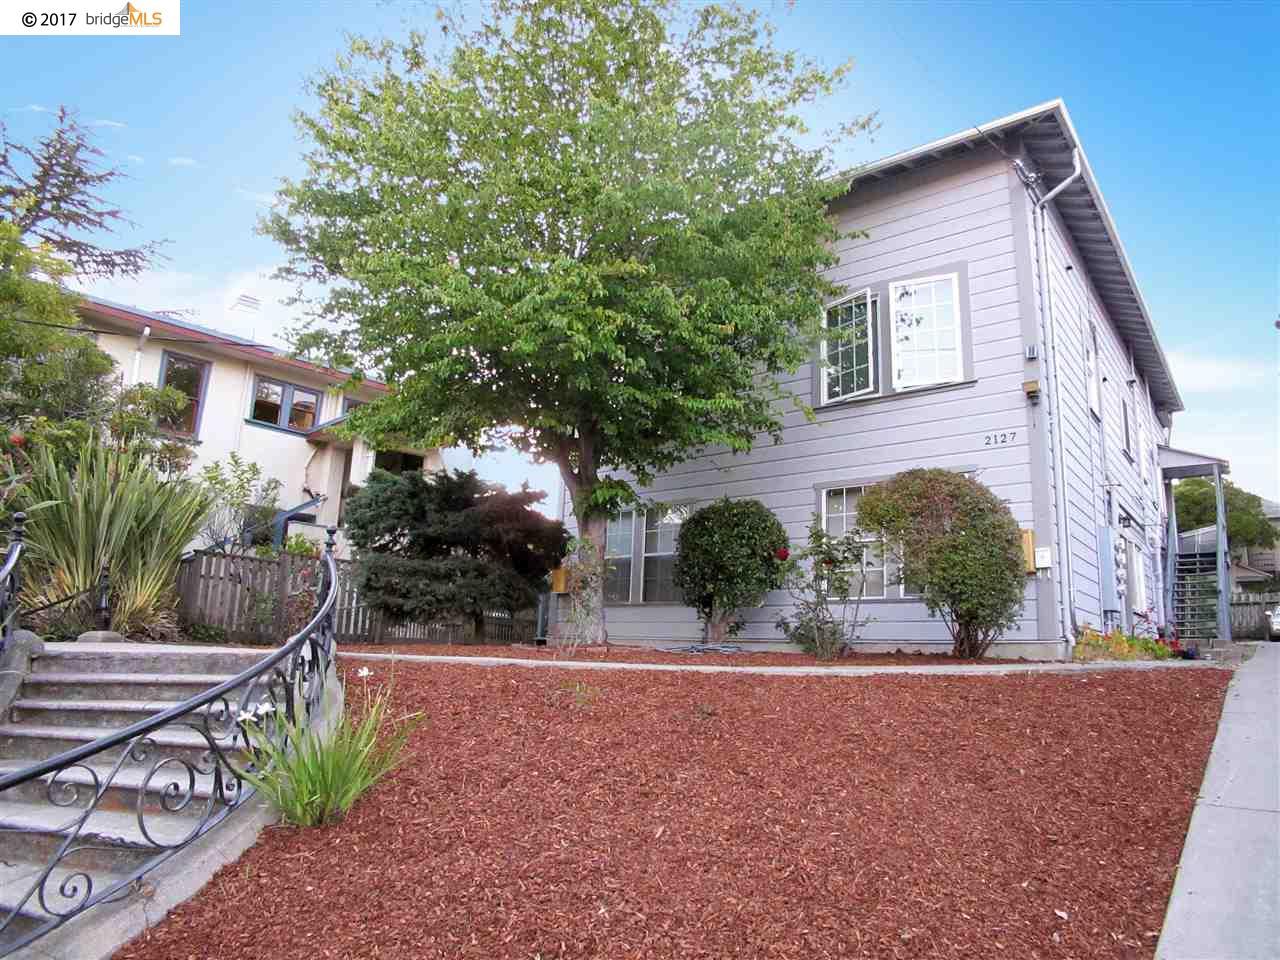 2125 Cedar St, BERKELEY, CA 94709